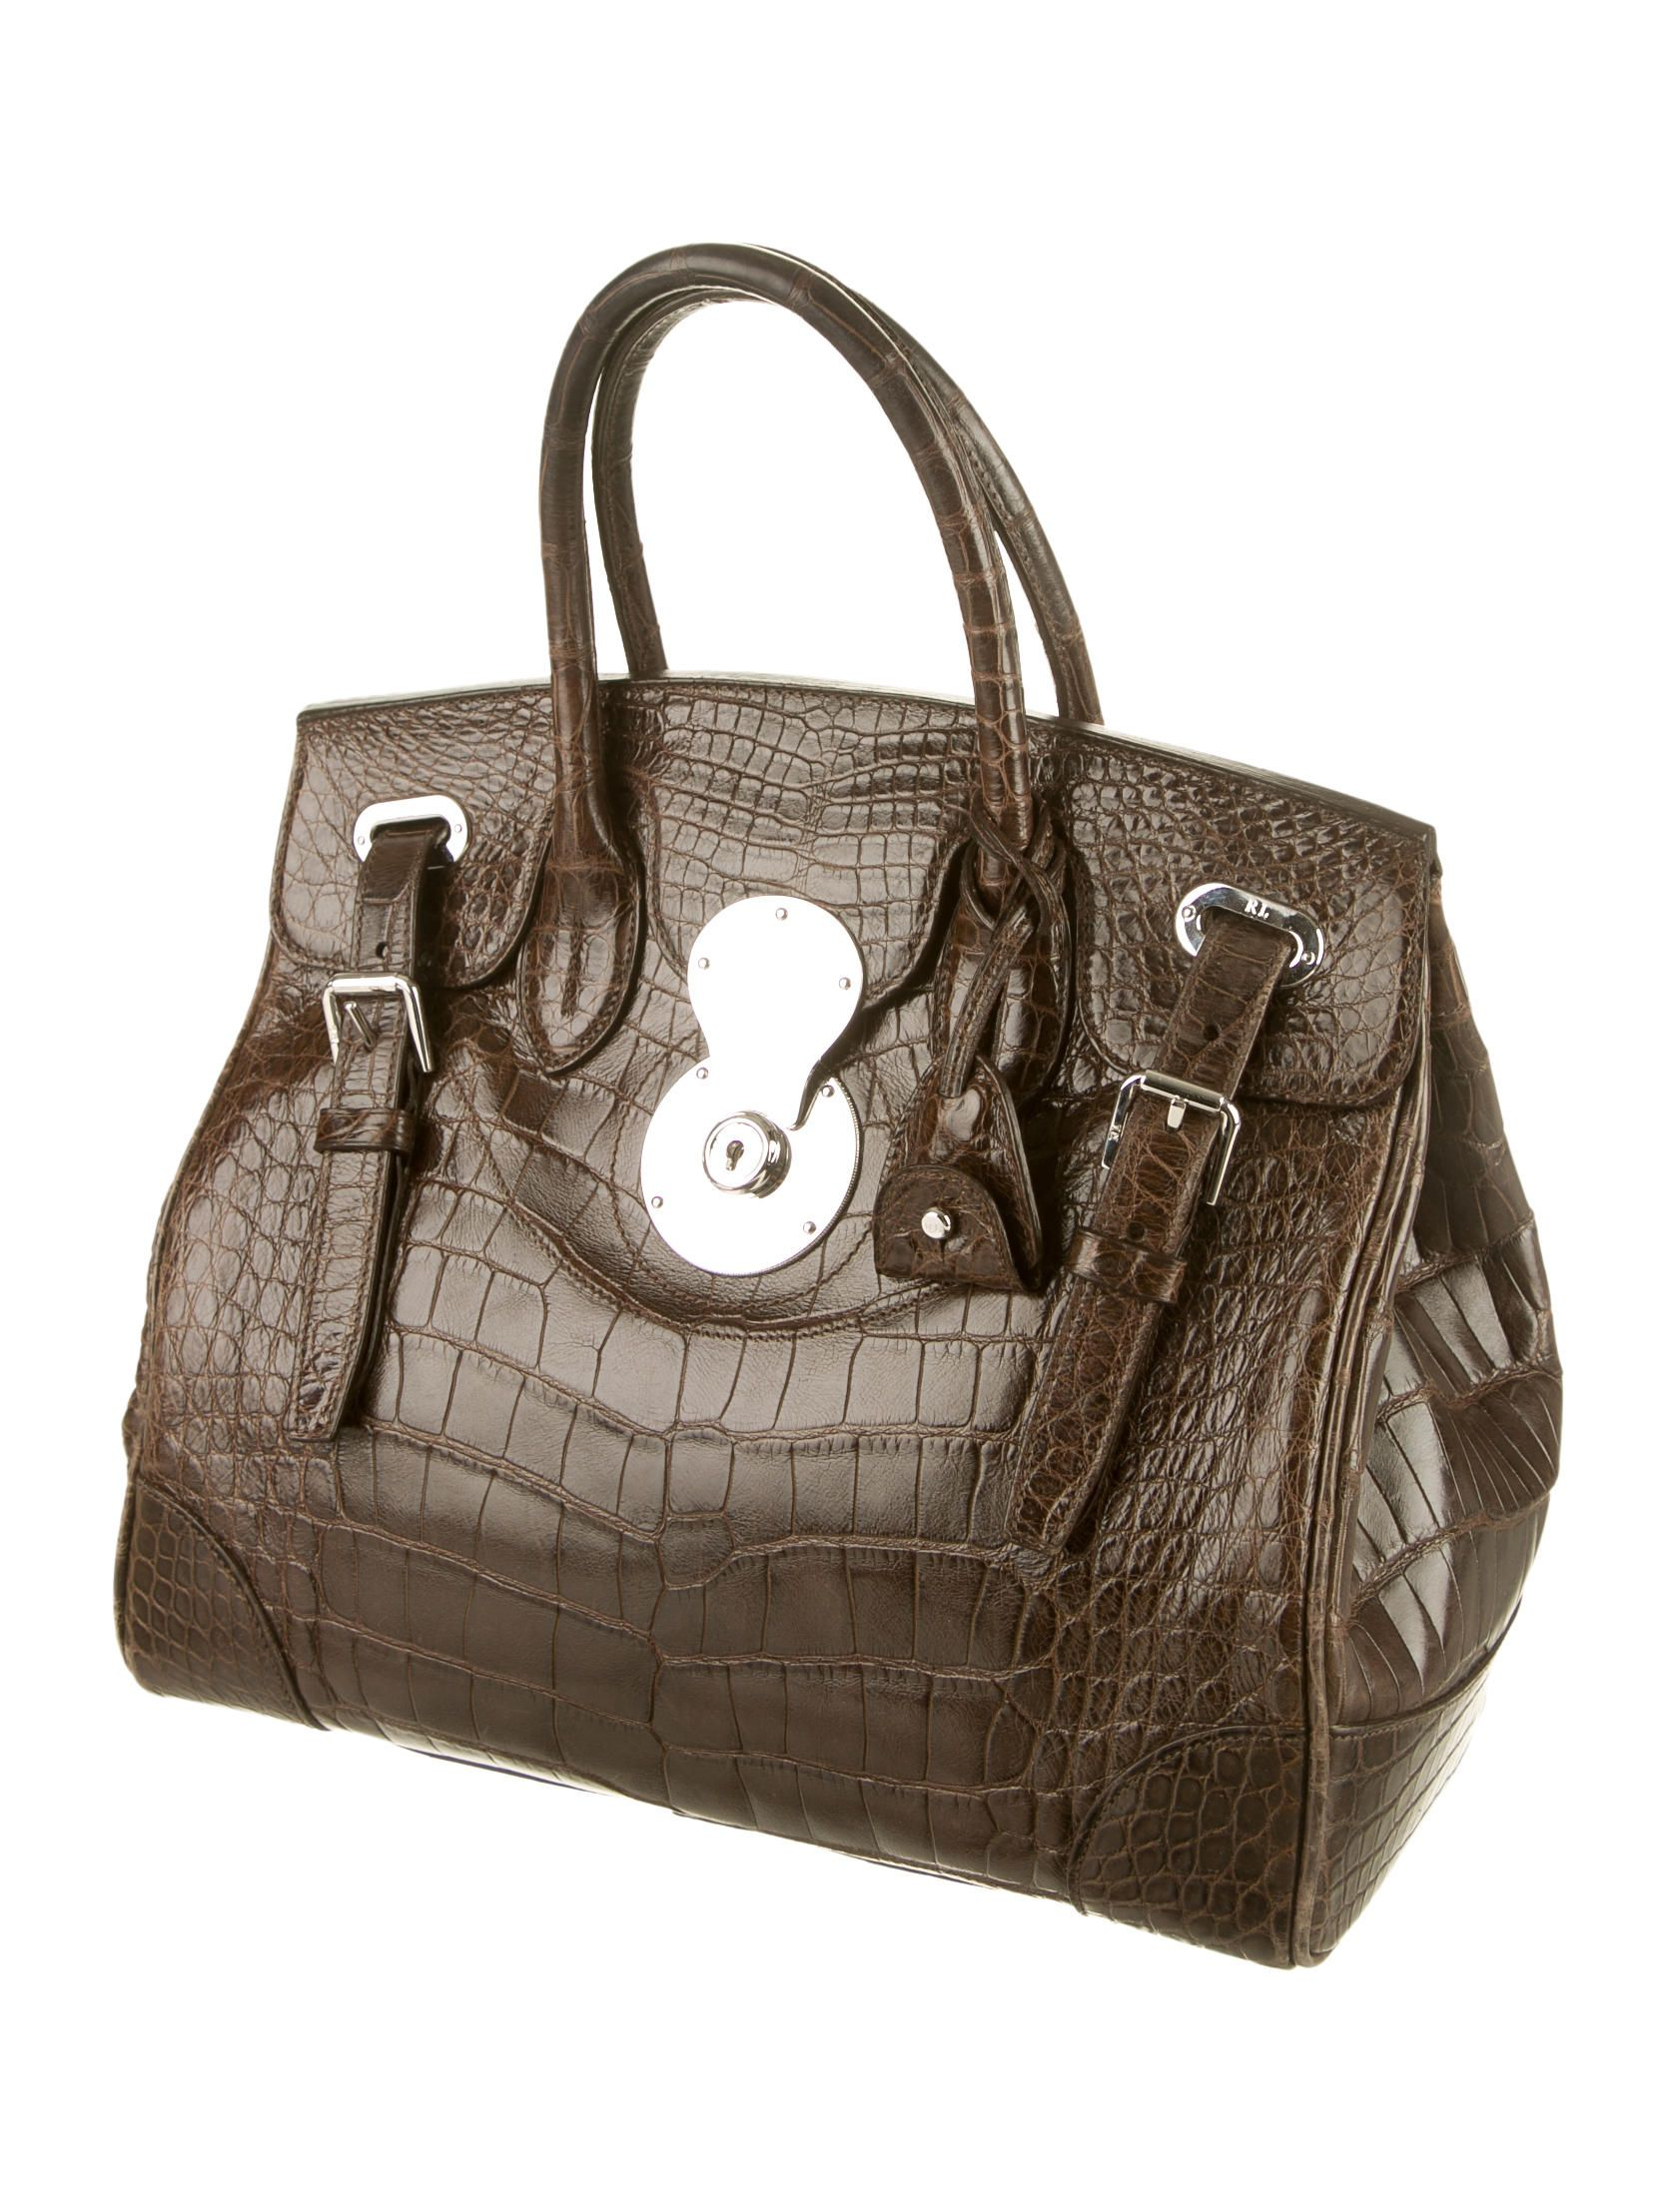 e47d8f2e3112 ... coupon ralph lauren alligator ricky bag handbags wyg20192 the realreal  a4389 78d41